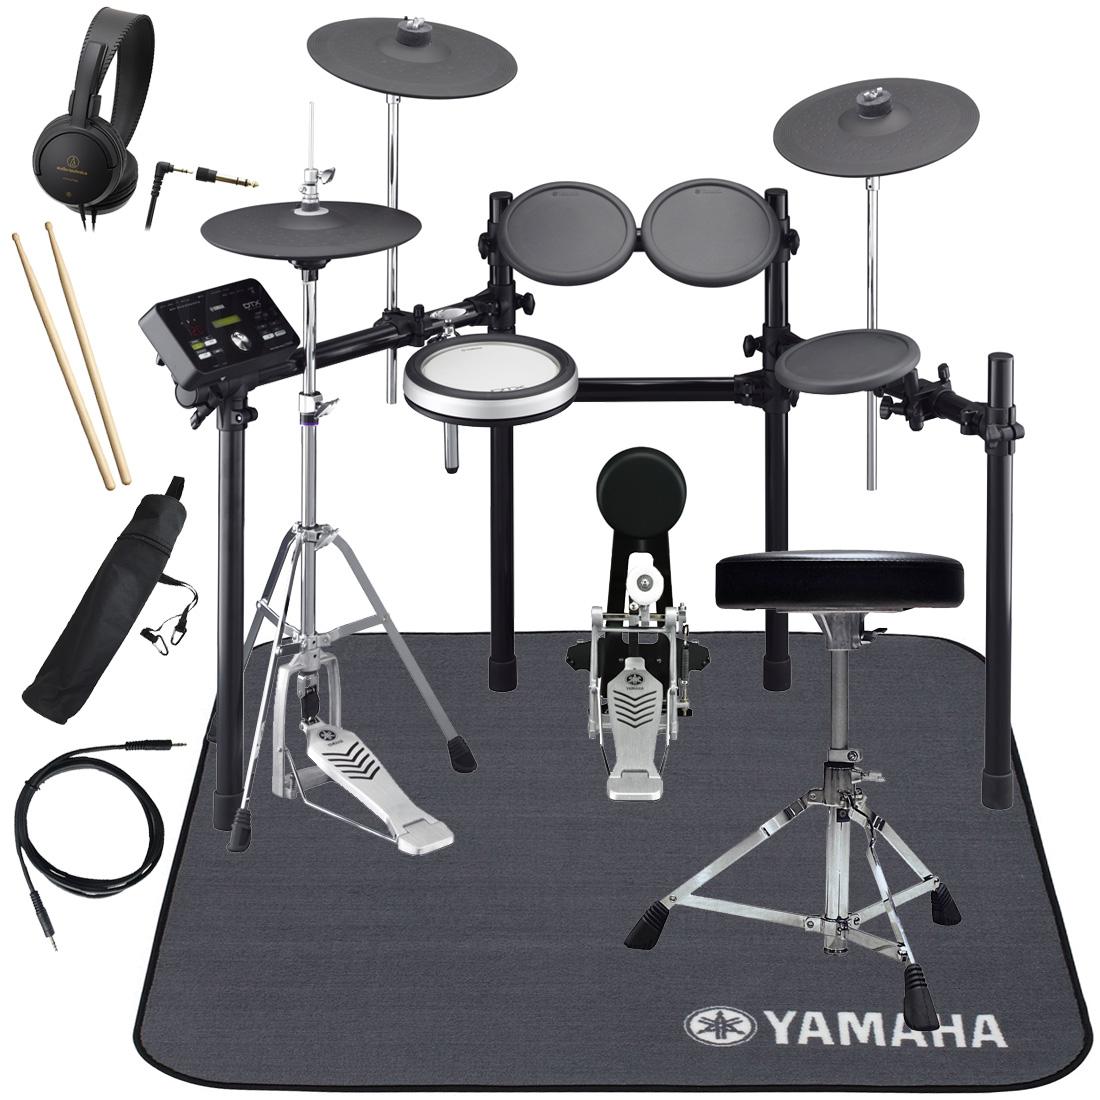 YAMAHA 電子ドラム DTX532KFS ドラムマットDM1314付き スターターパック【YRK】